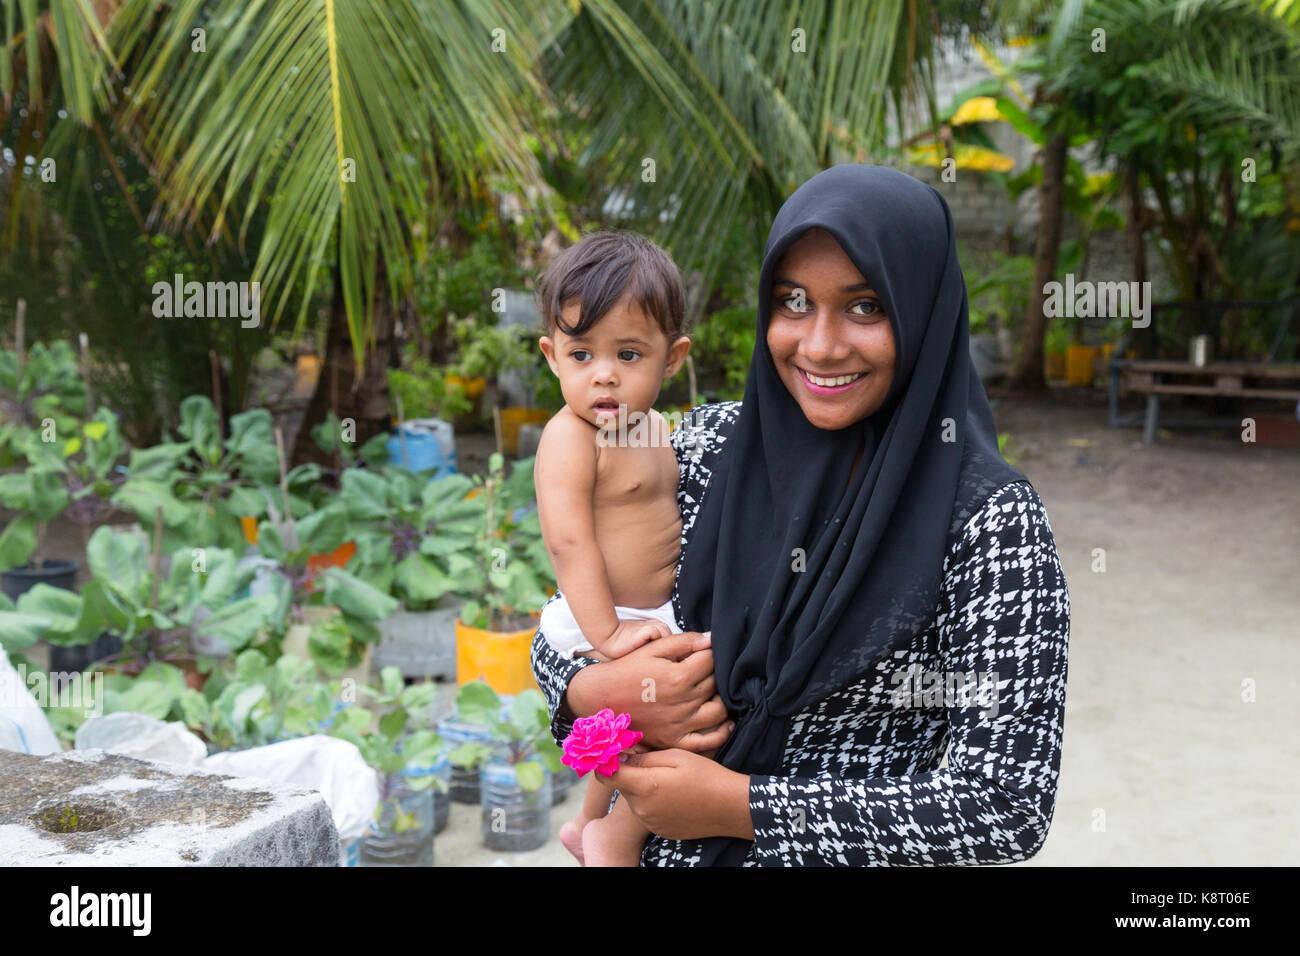 maldives-people-a-young-maldives-asian-muslim-woman-carrying-a-child-K8T06E.jpg